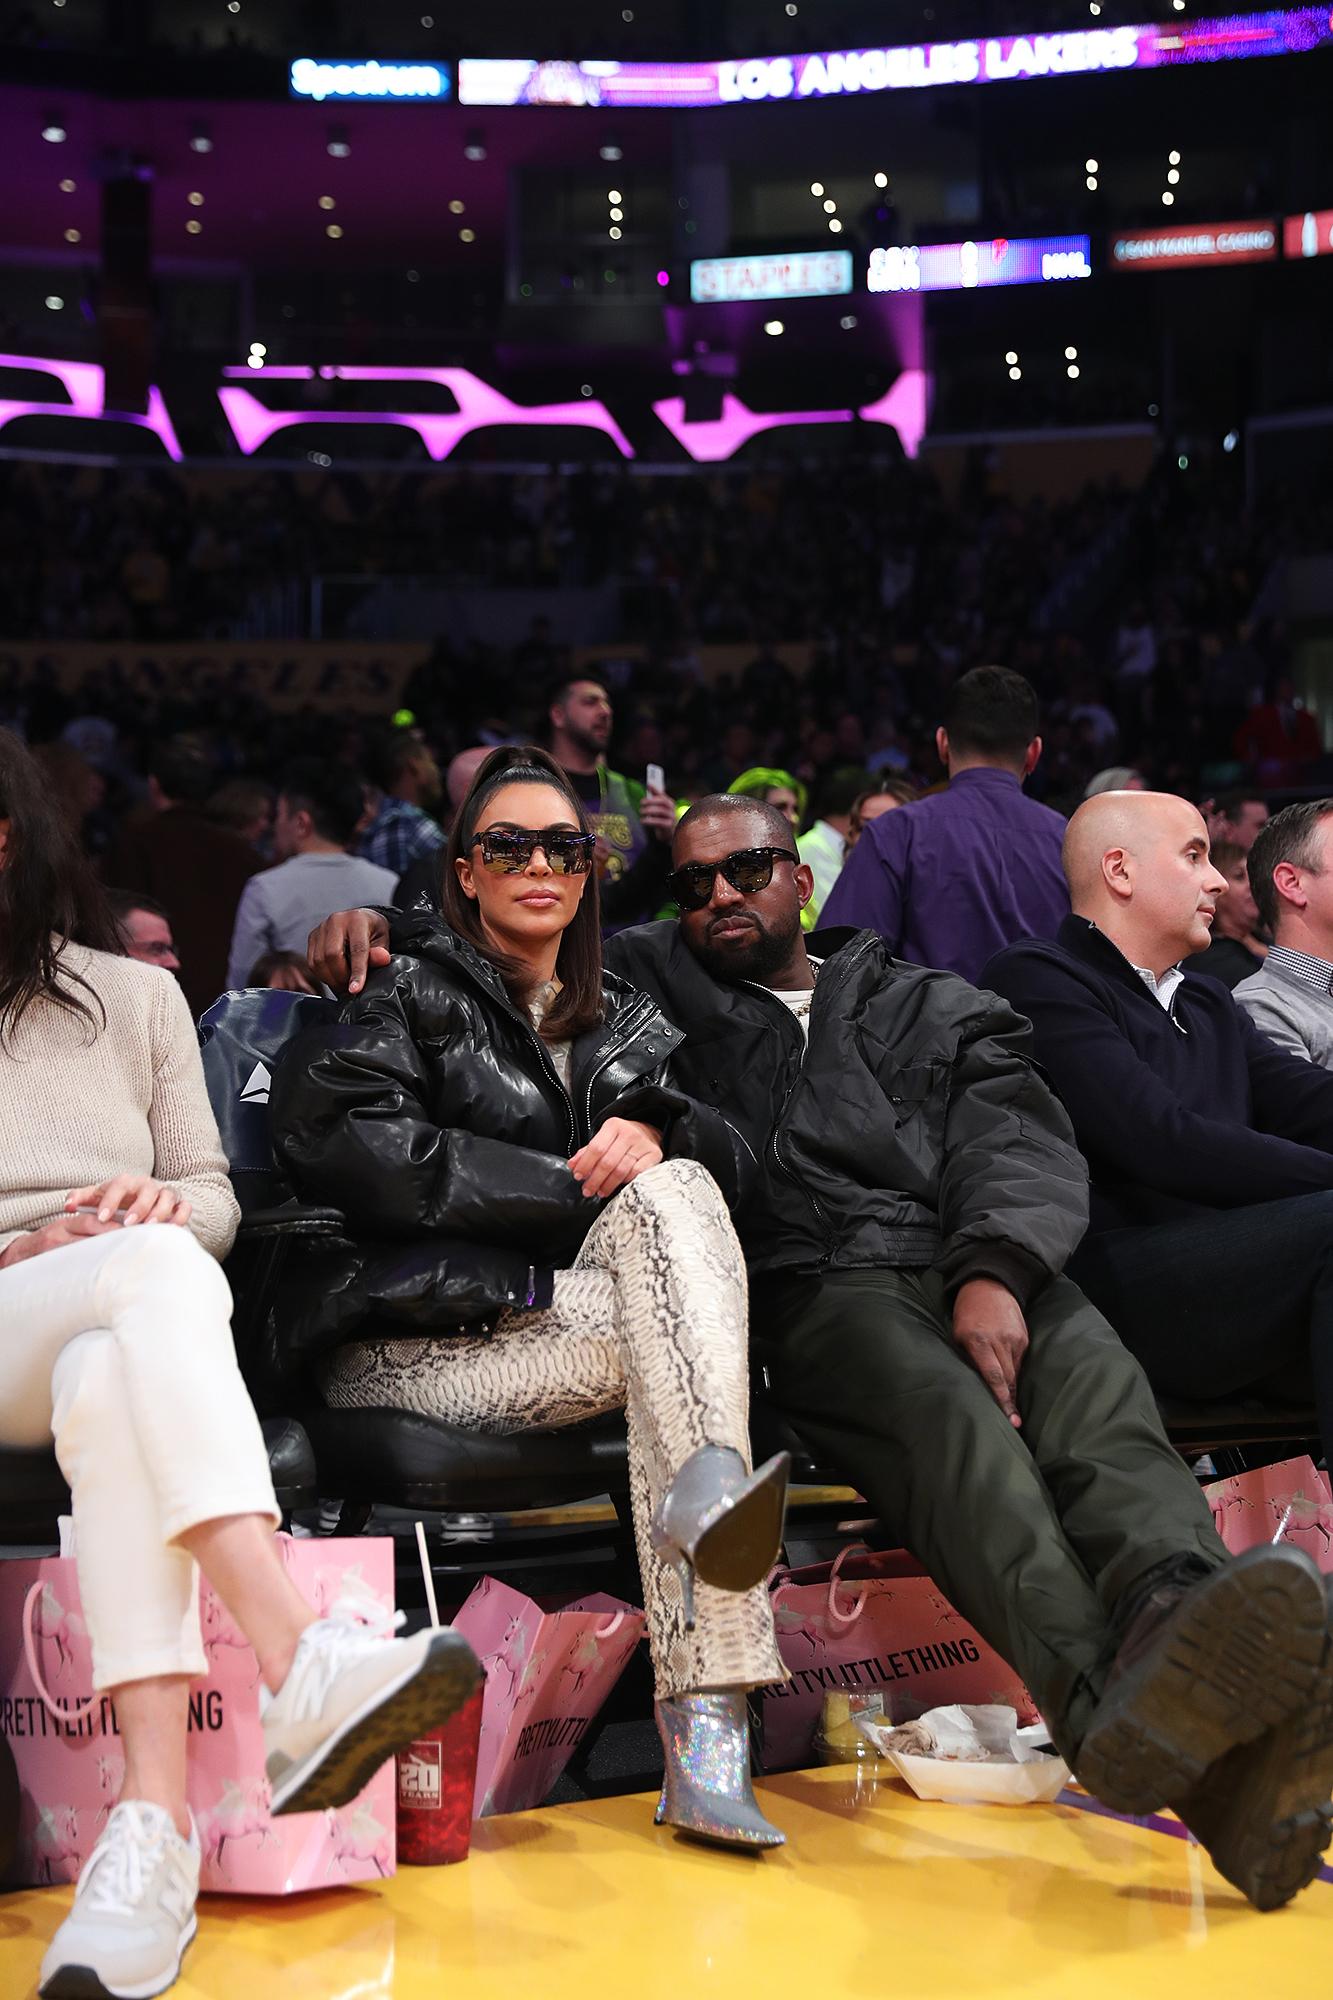 KIm-Kardashian-Kanye-West-Lakers